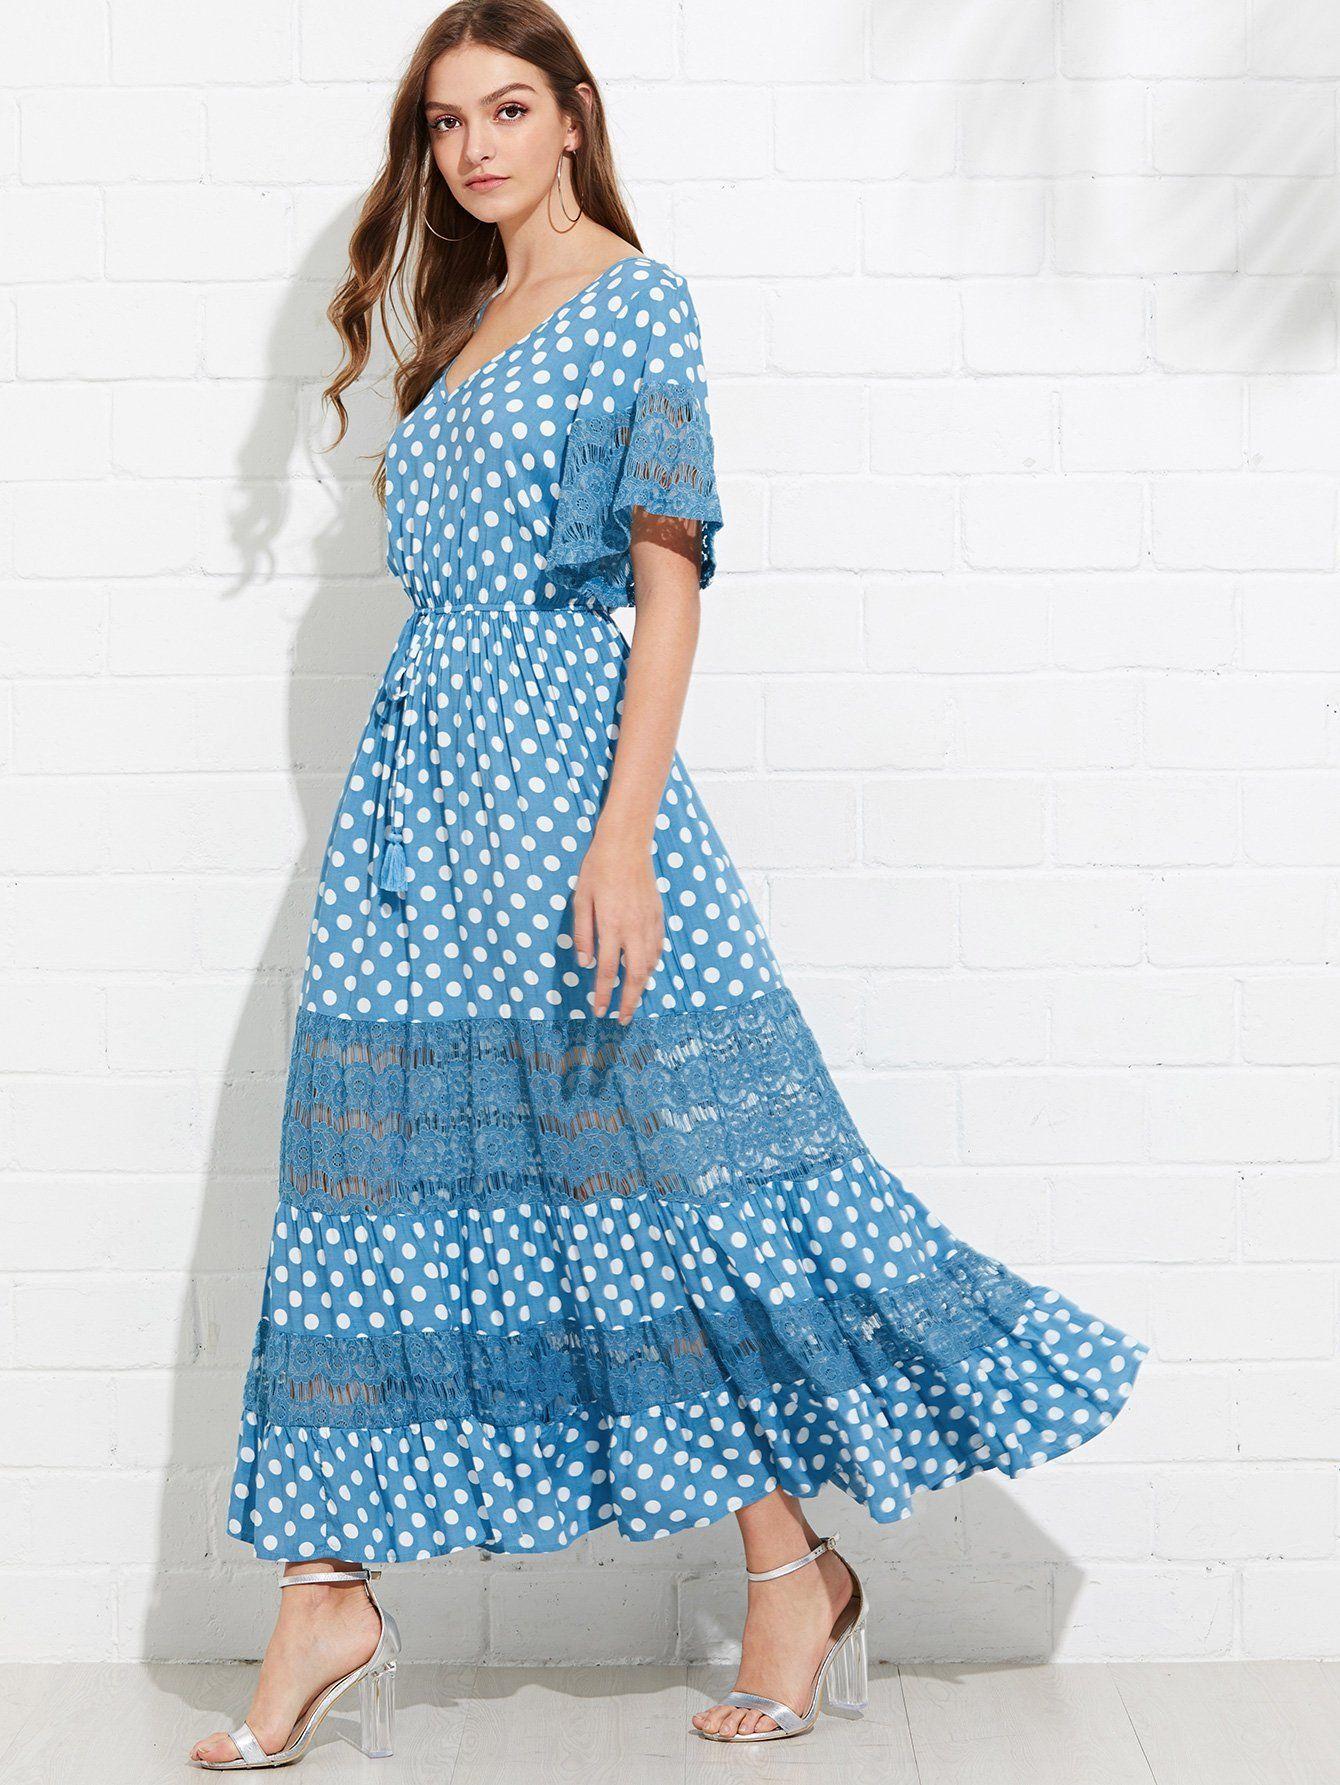 Floral Lace Insert Polka Dot Dress Fashion Clothing